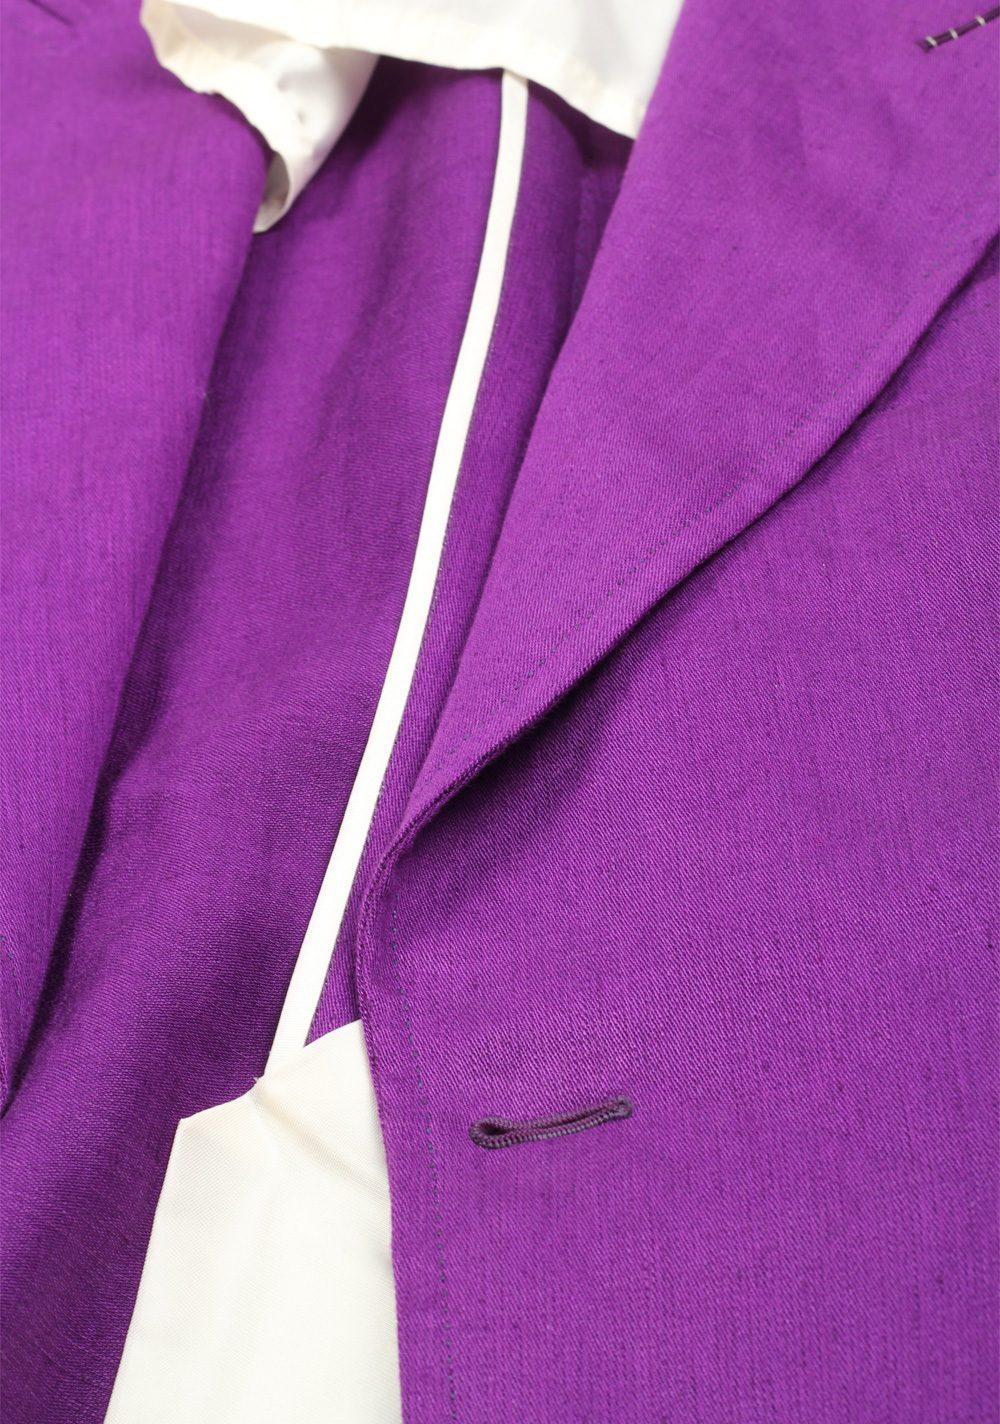 TOM FORD Spencer Purple Sport Coat Size 50 / 40R U.S. | Costume Limité